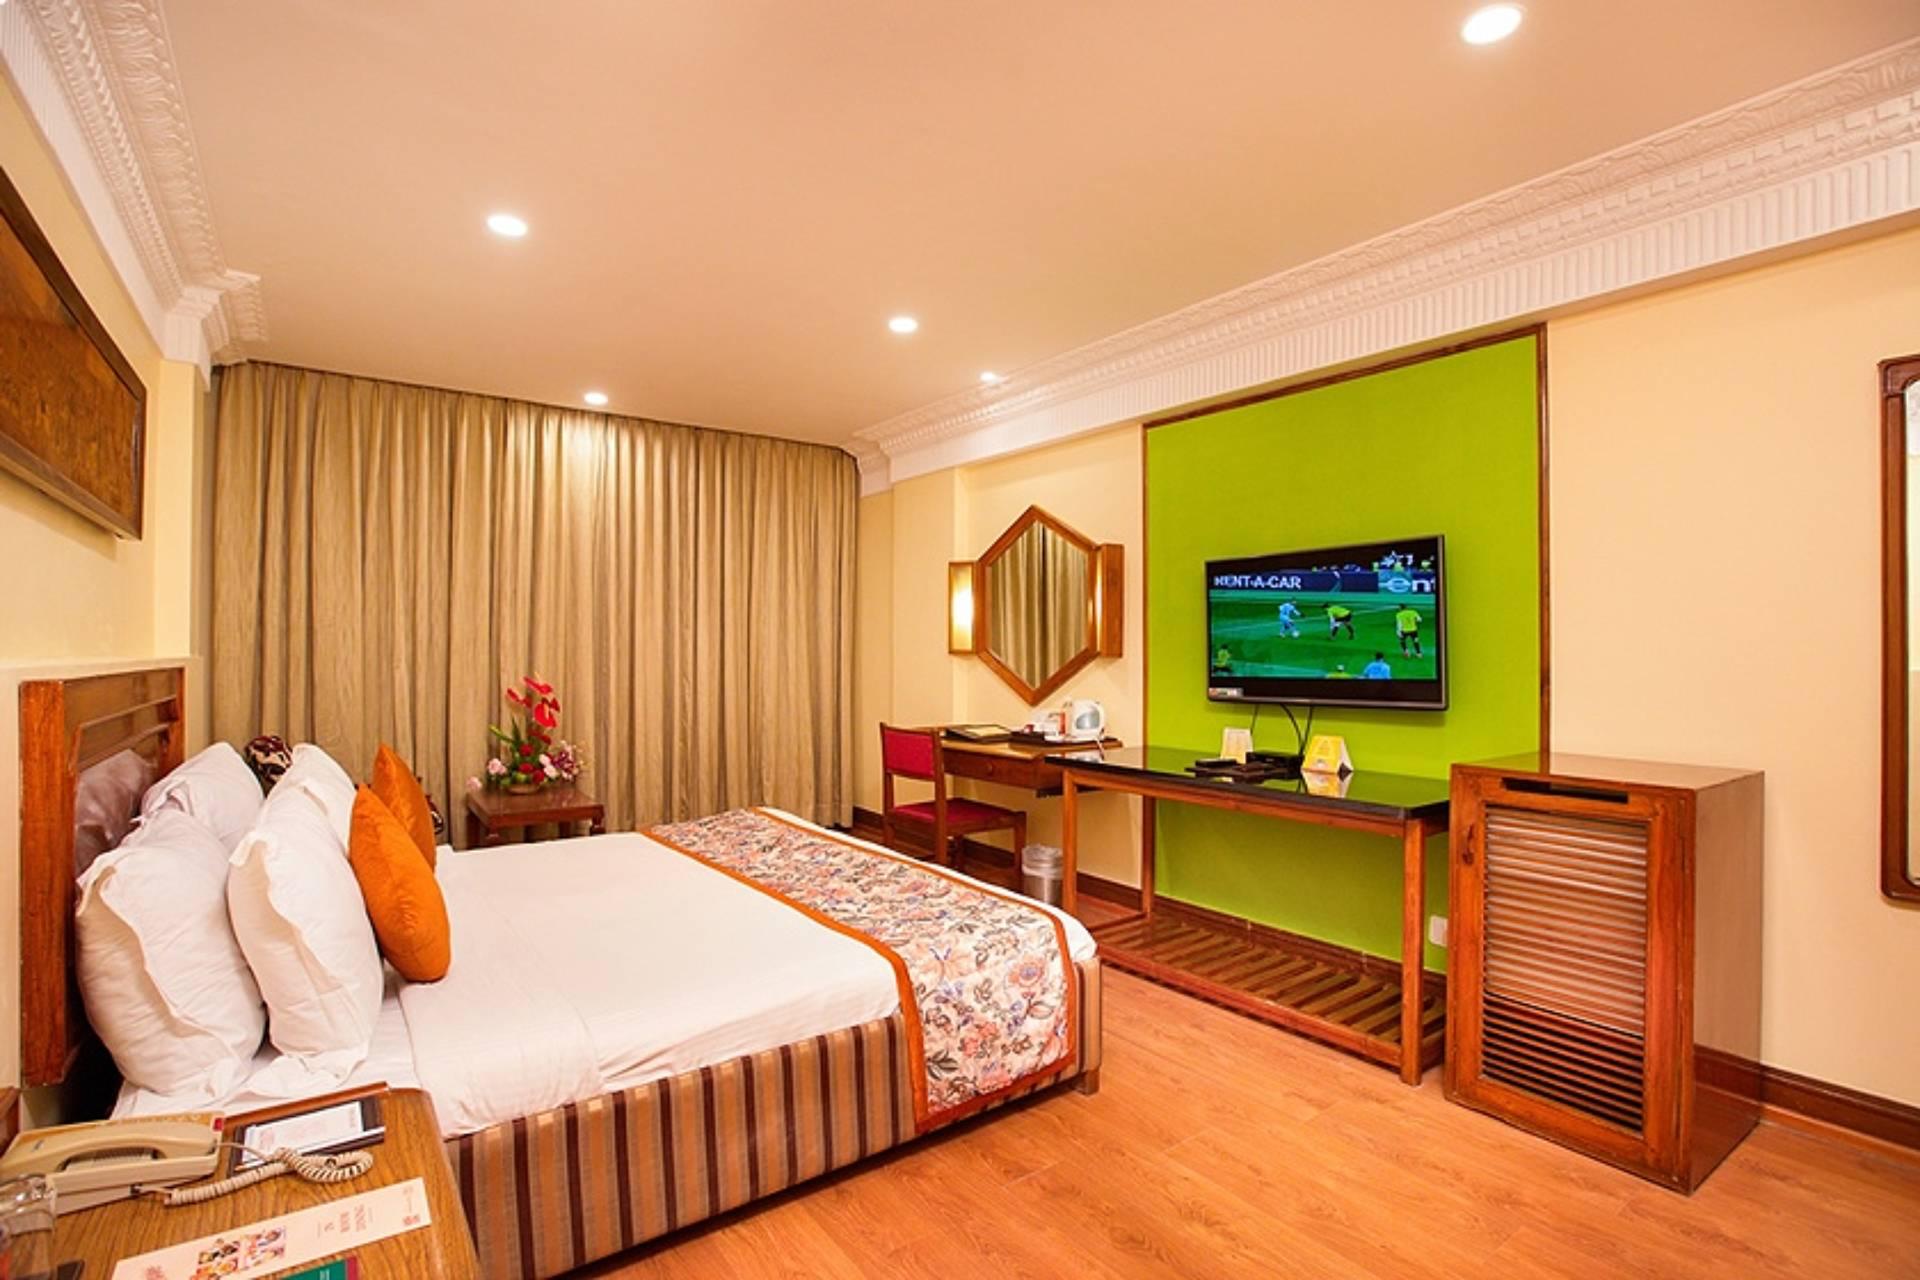 chennai executive room ambassador pallava side 2 - The Ambassador | Heritage Hotels in Mumbai, Aurangabad, Chennai - Executive Room